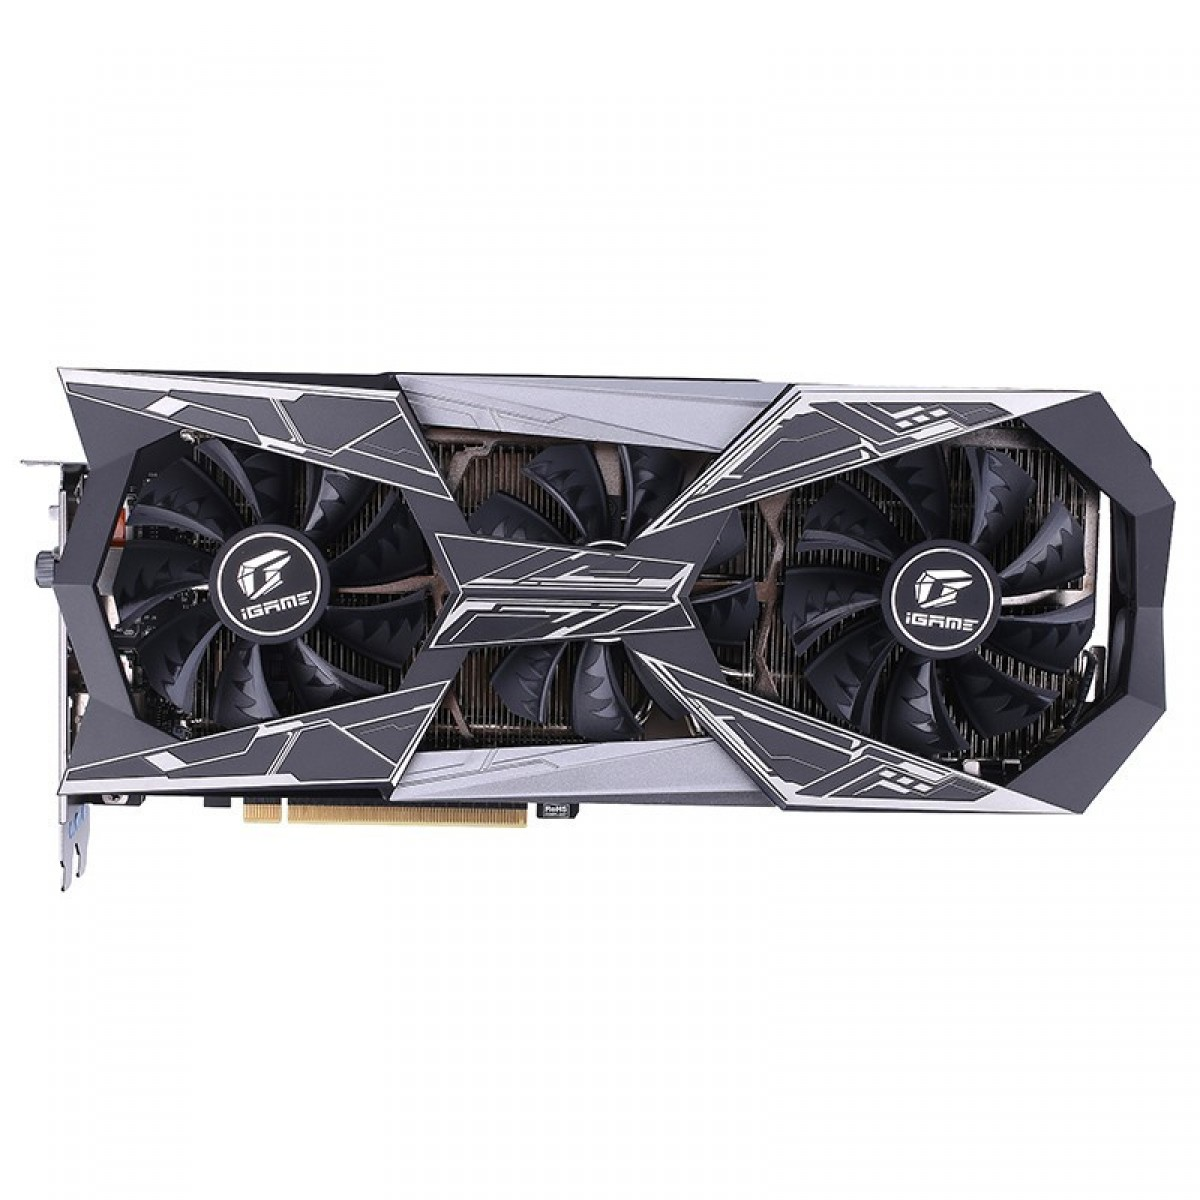 Placa de Vídeo Colorful iGame GeForce RTX 2060 SUPER Vulcan X OC-V, 8GB GDDR6, 256Bit